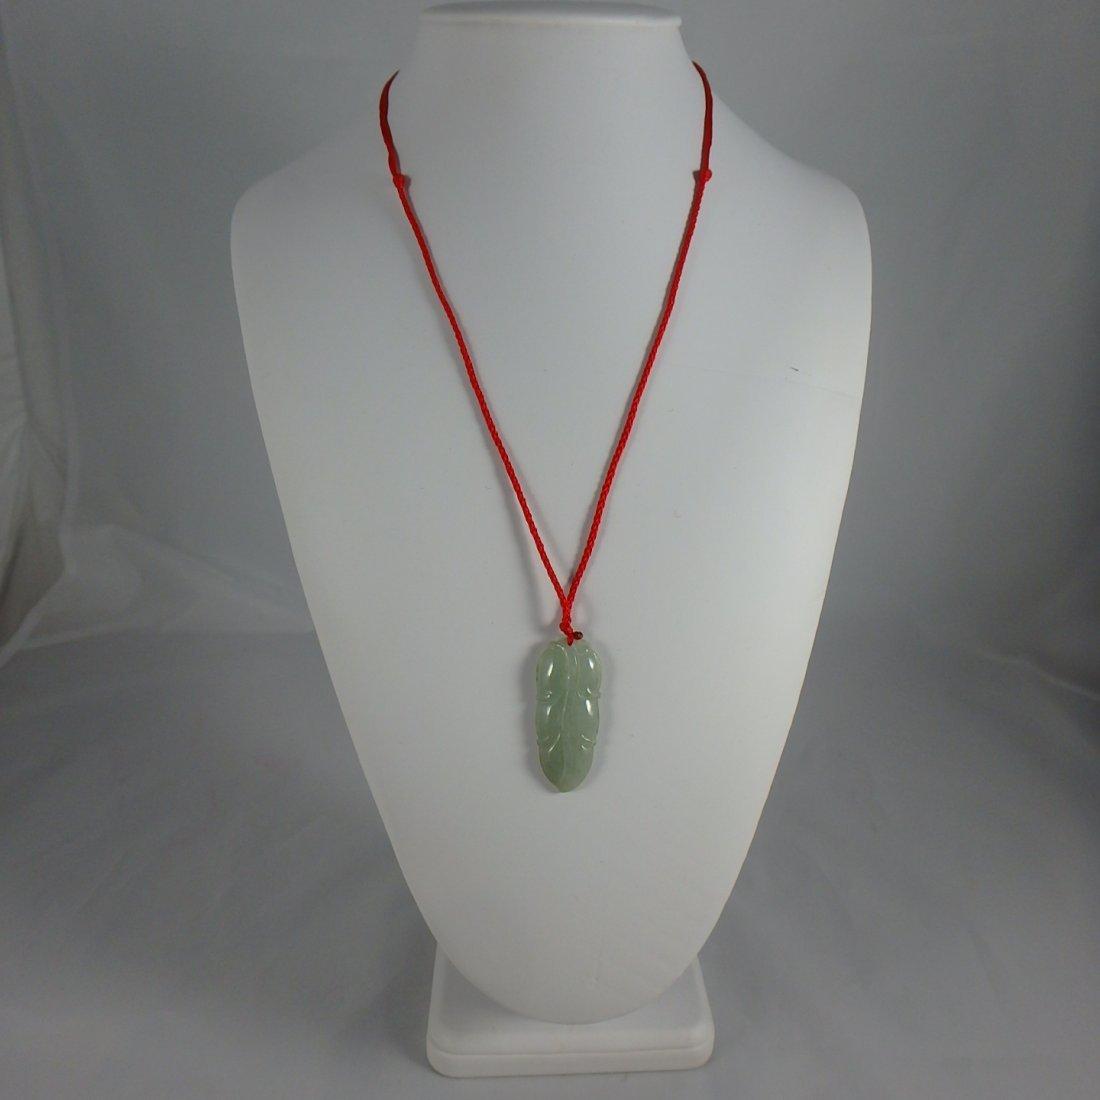 Chinese Jadeite Pendant/Necklace